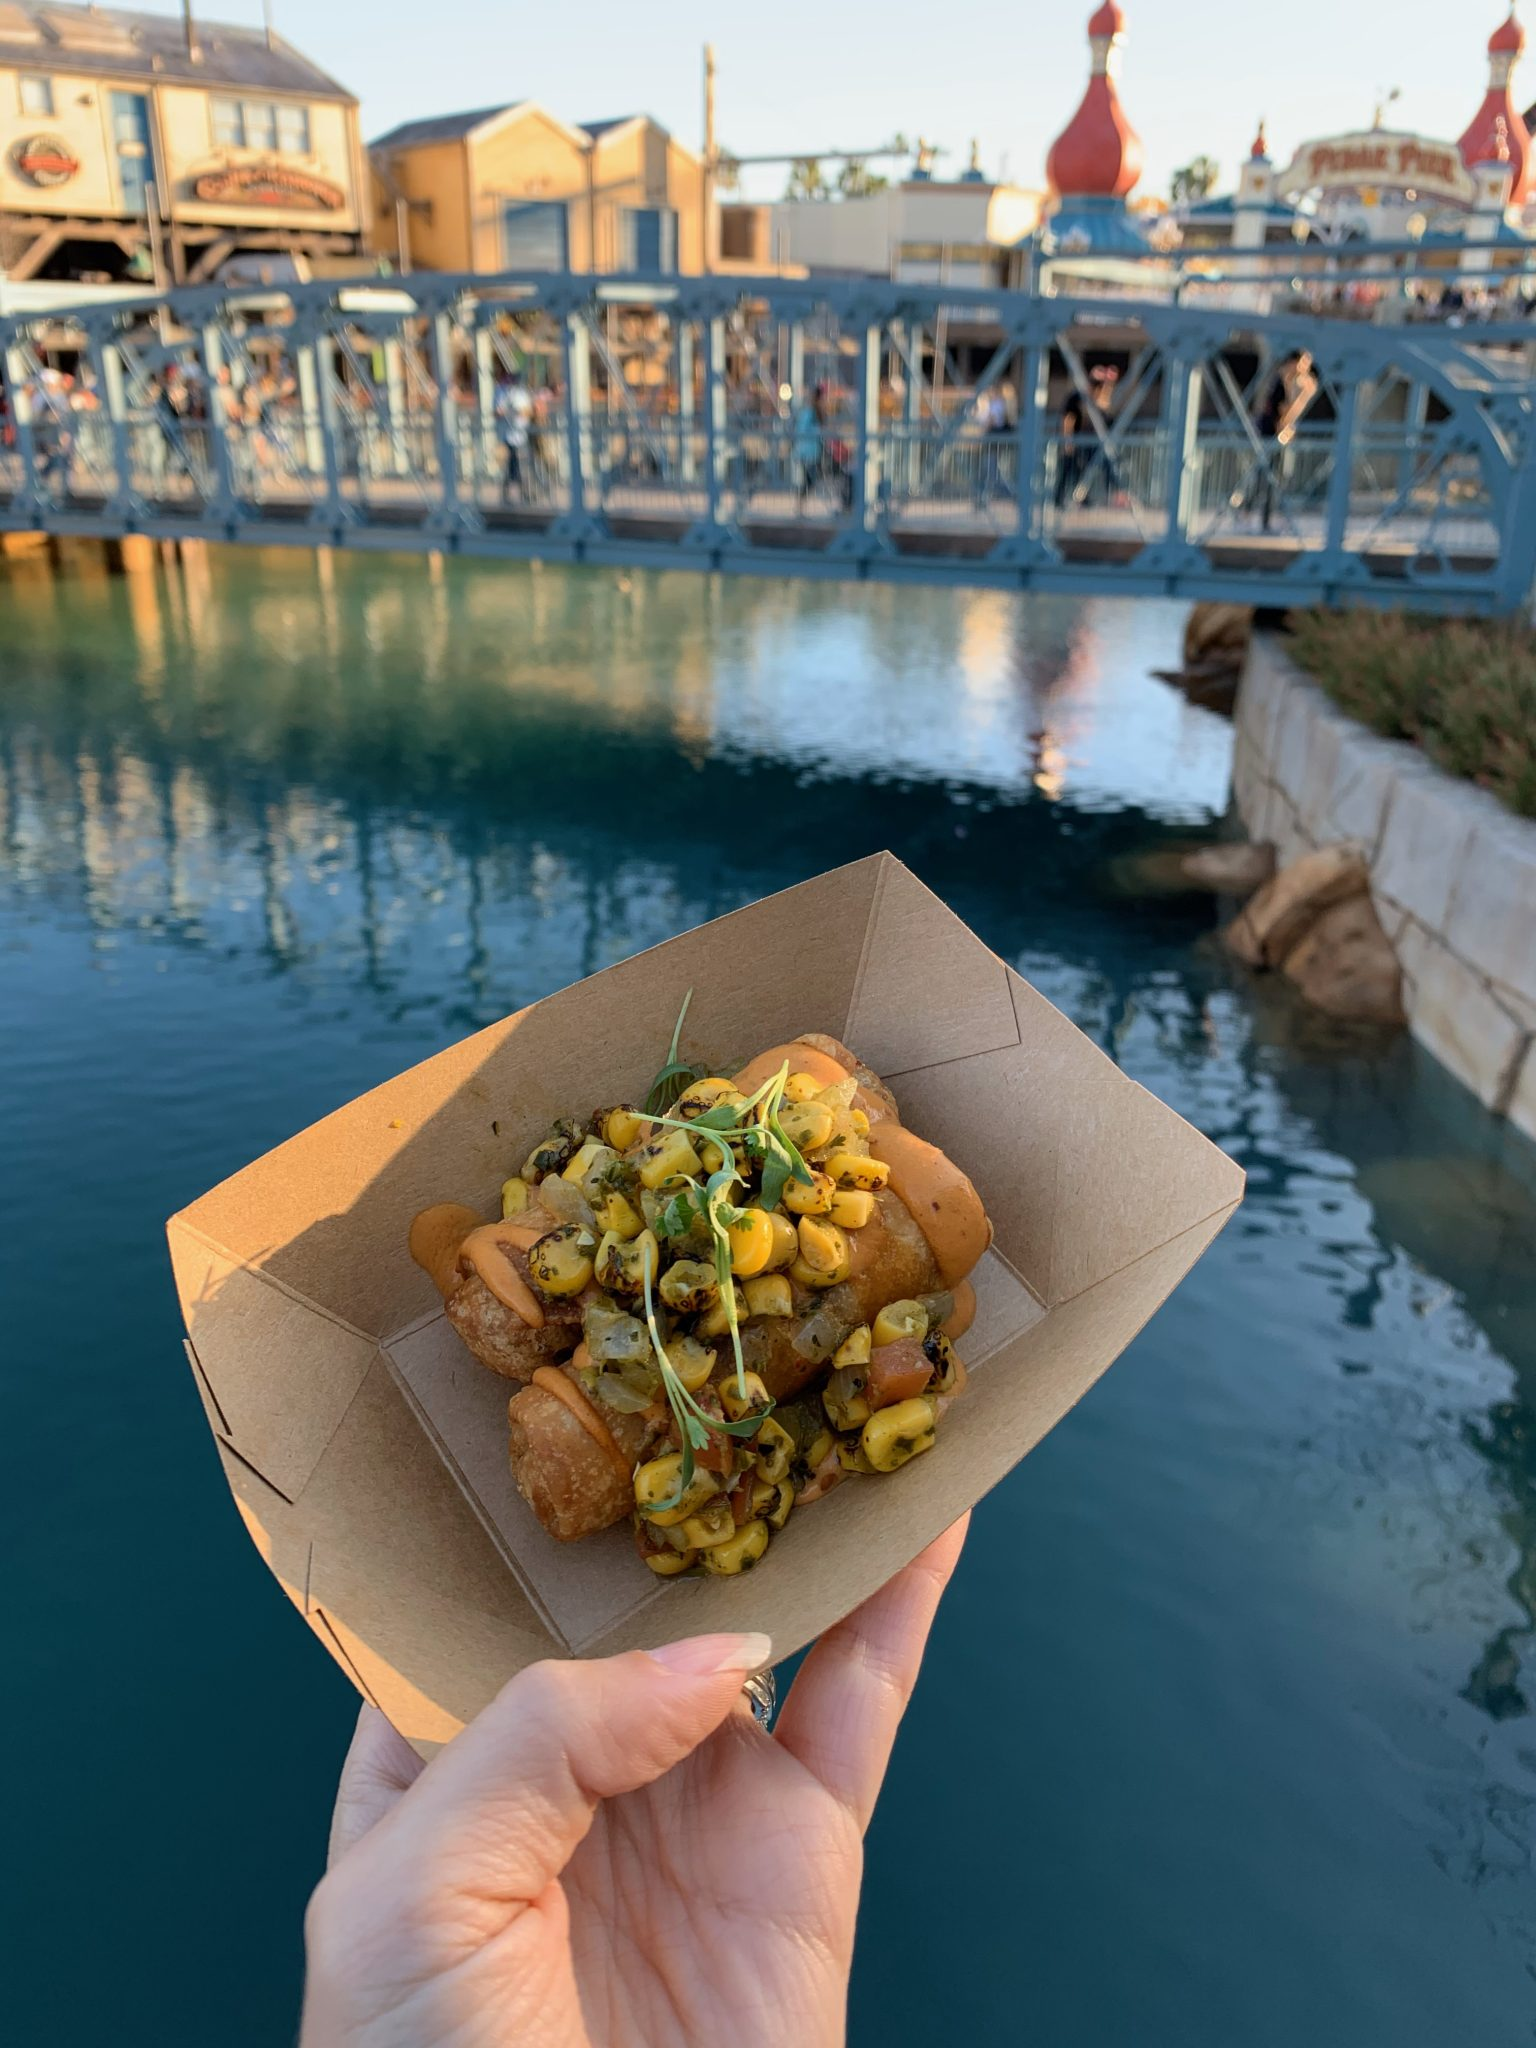 2020 Disney California Adventure Food & Wine Festival guide featured by top US Disney blogger, Marcie and the Mouse: Chimis at Disney California Food & Wine Festival